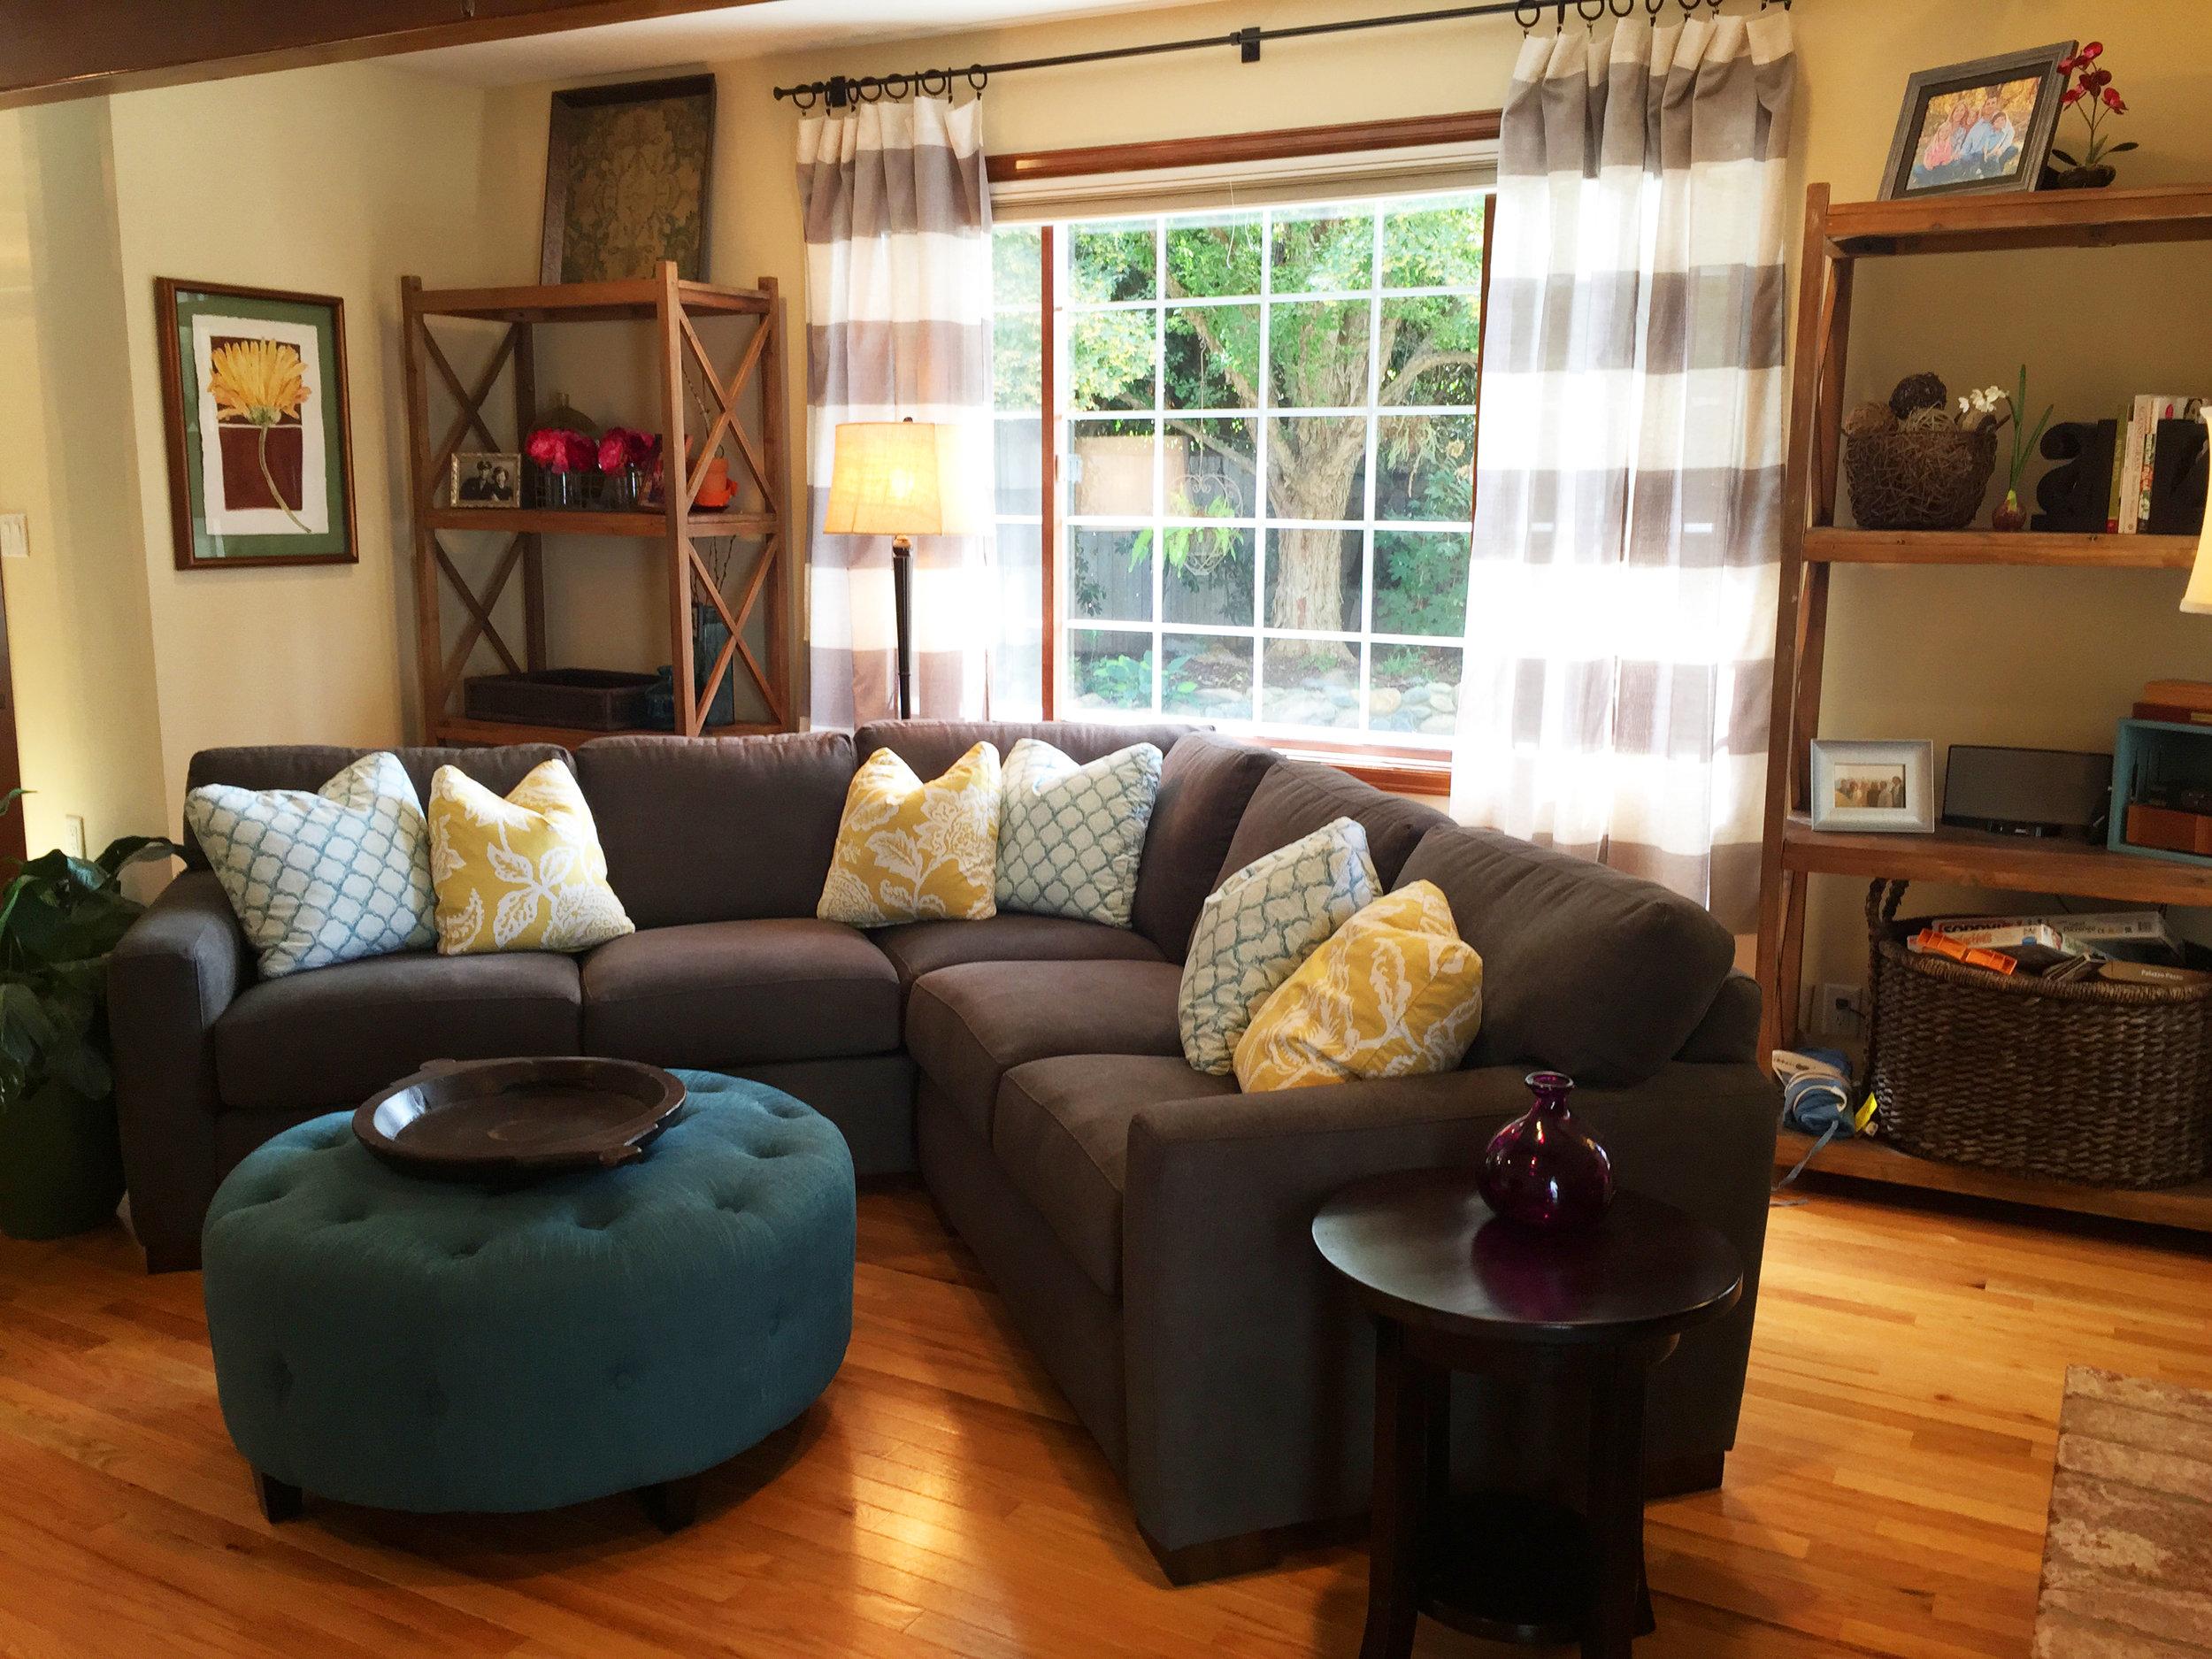 Roble Vista Family Room Remodel